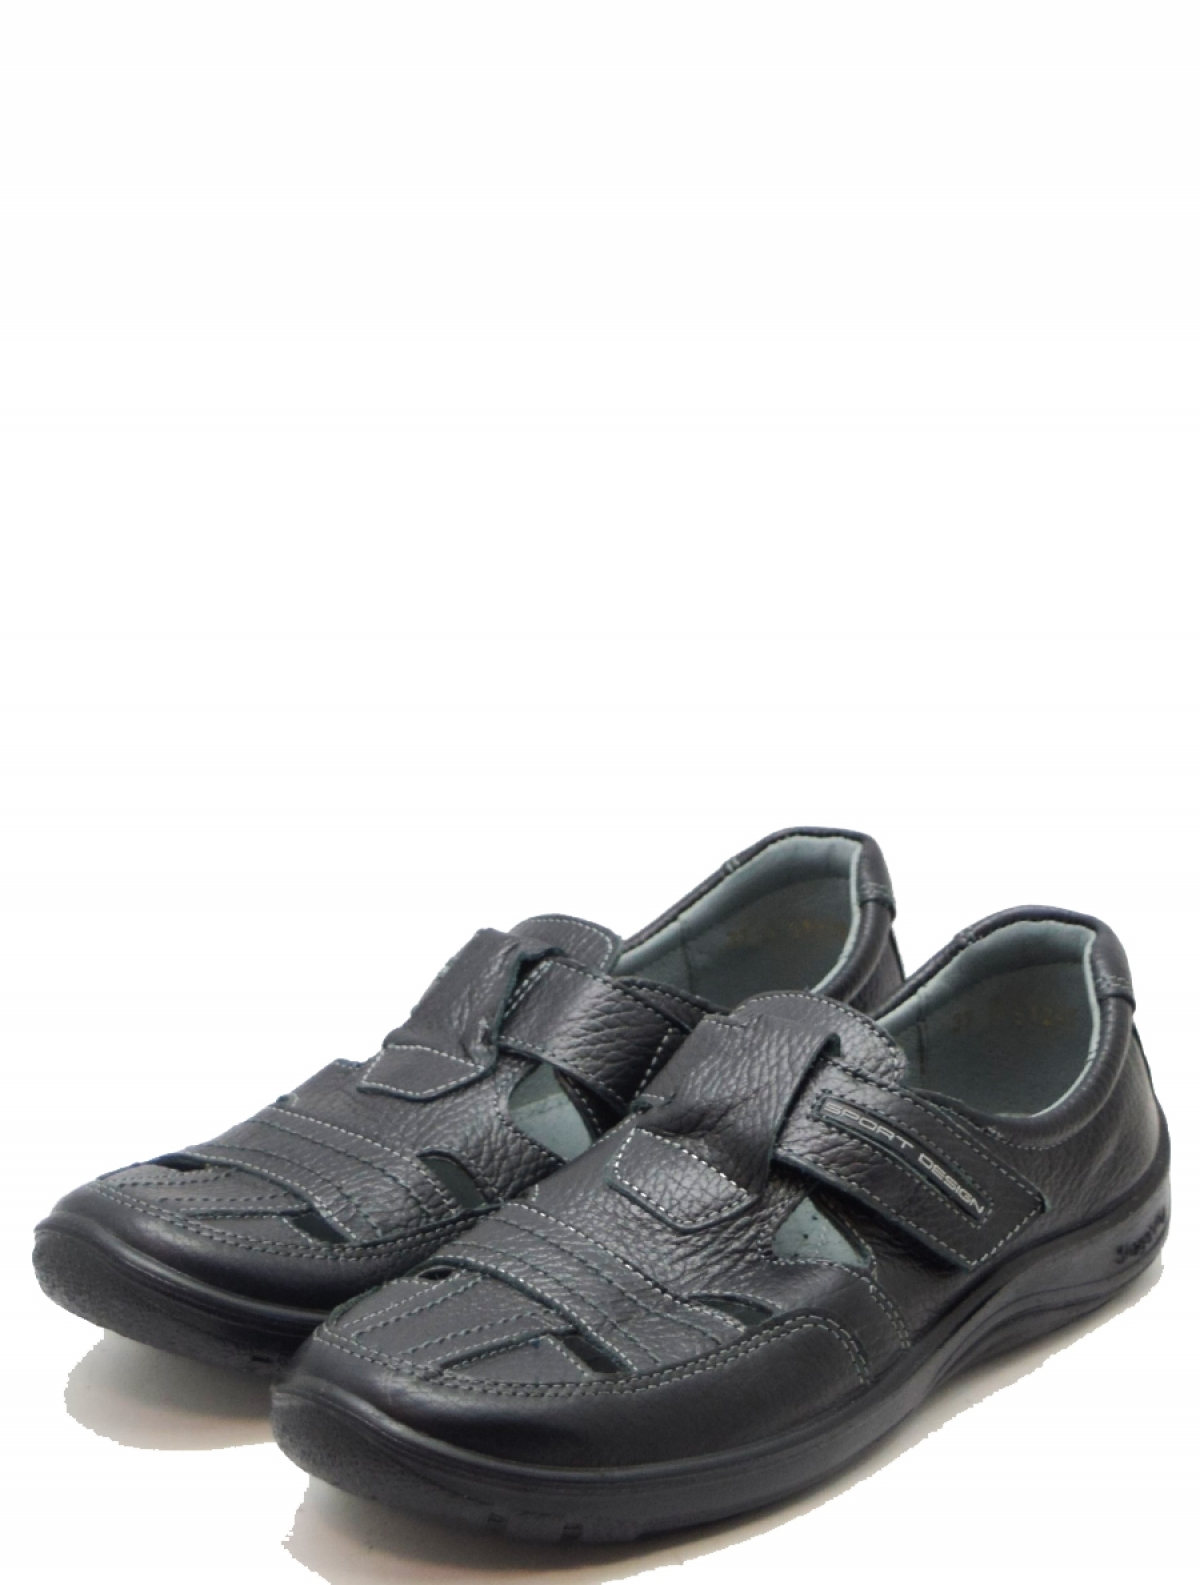 Shagovita 51247 детские туфли